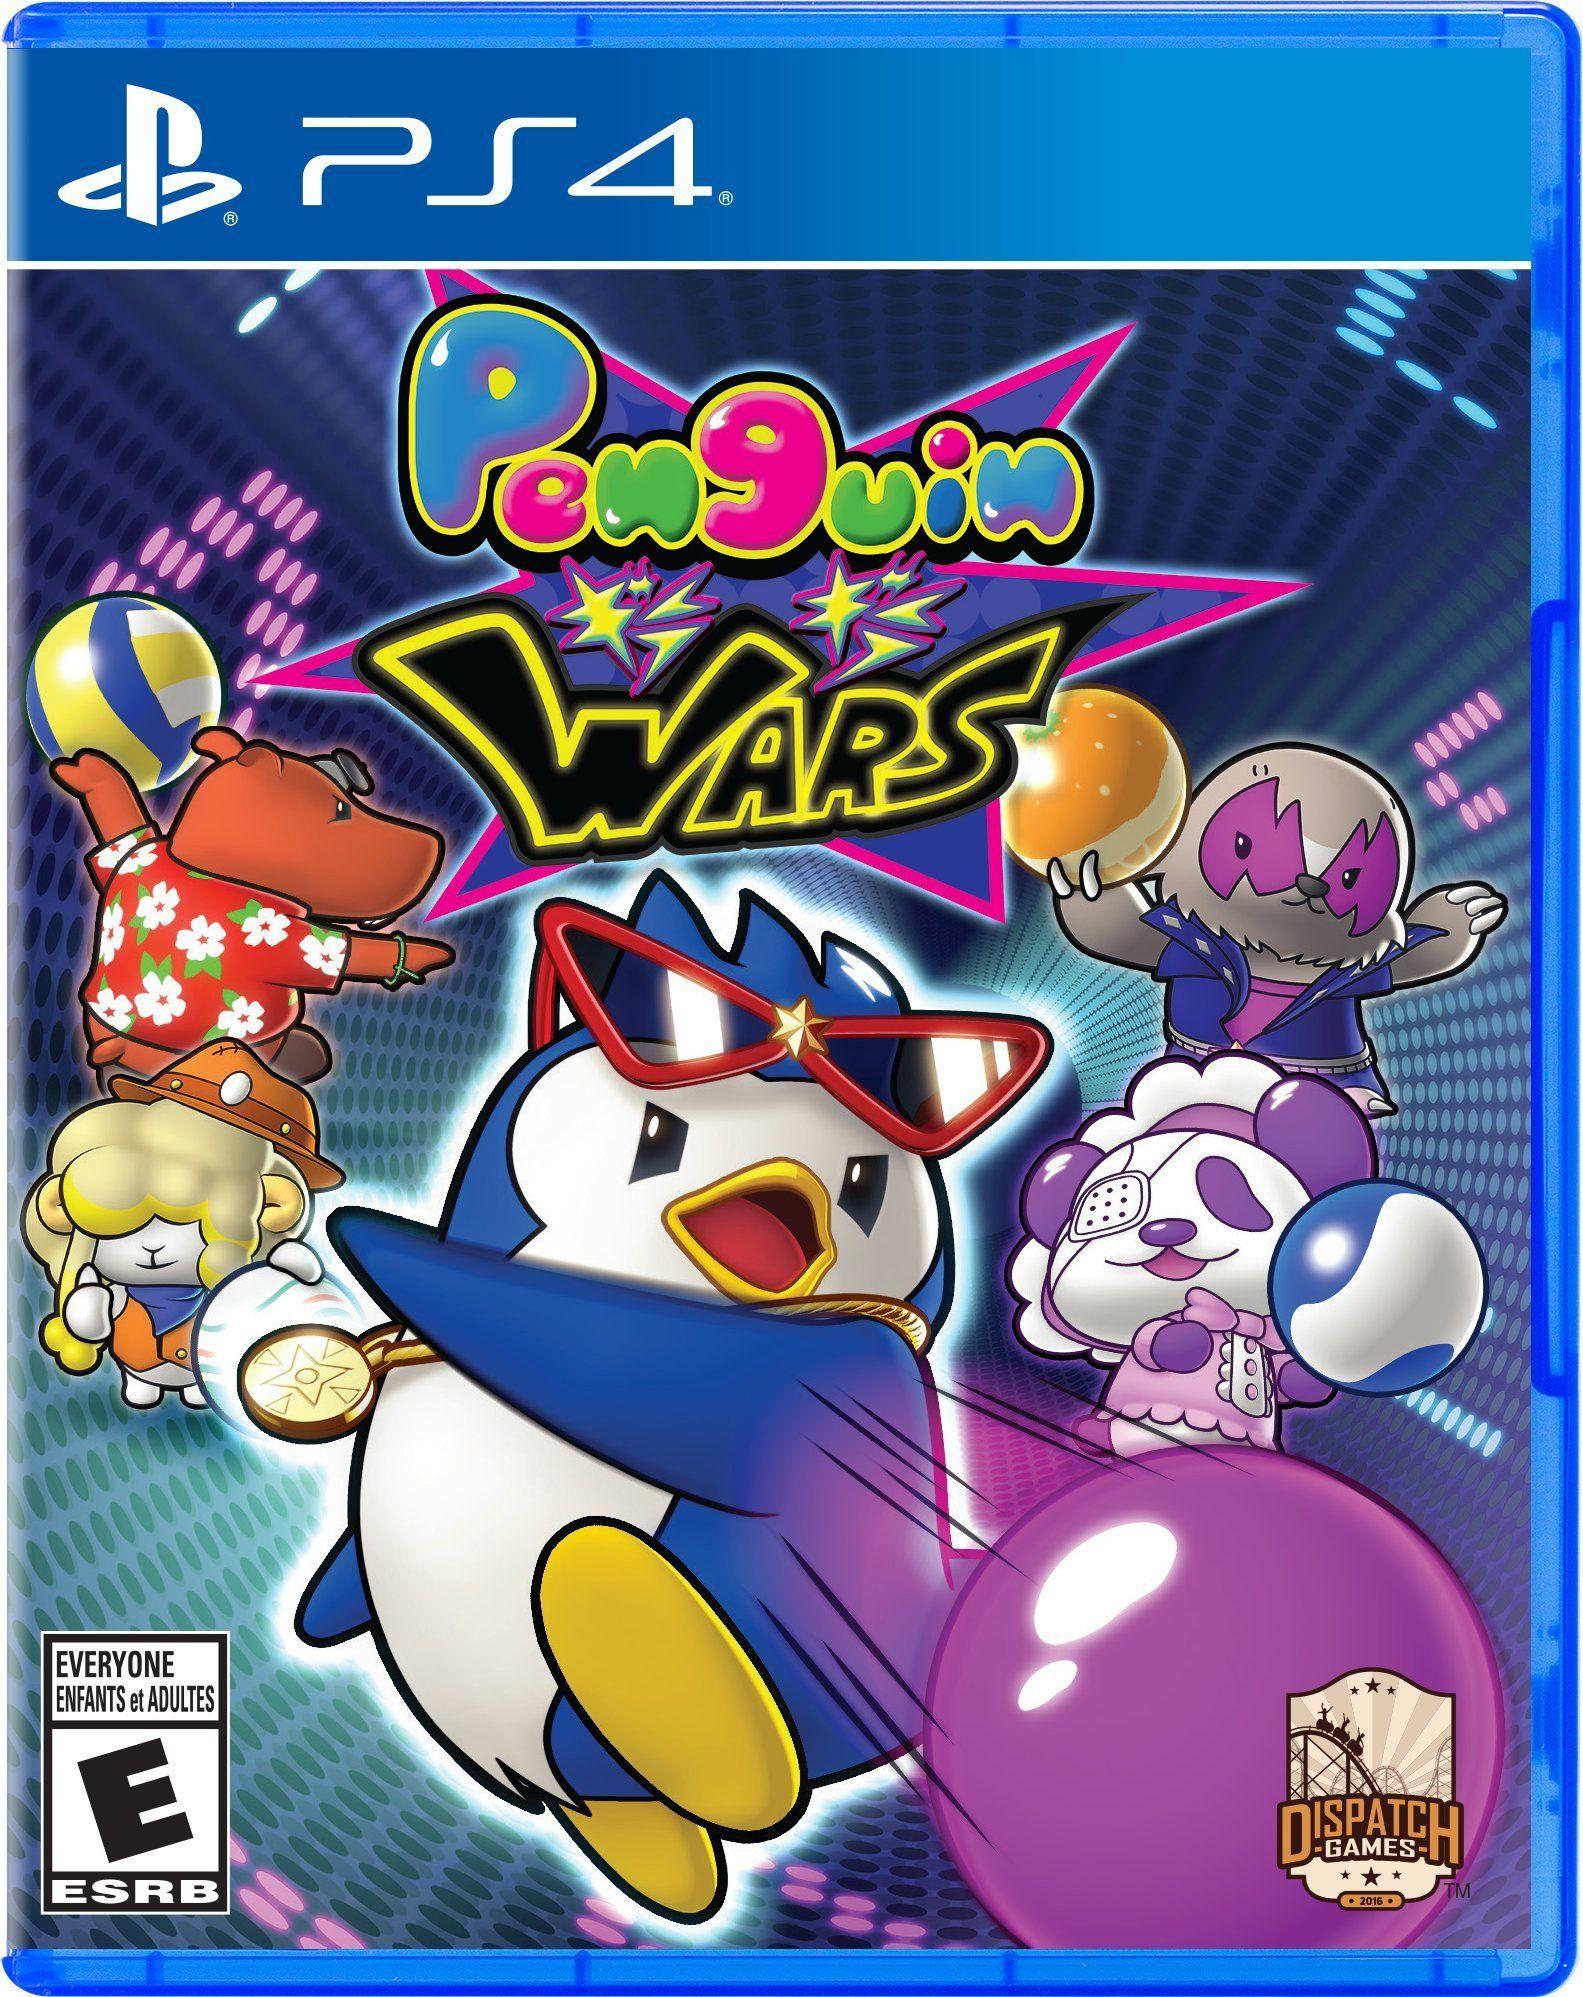 Penguin Wars Playstation